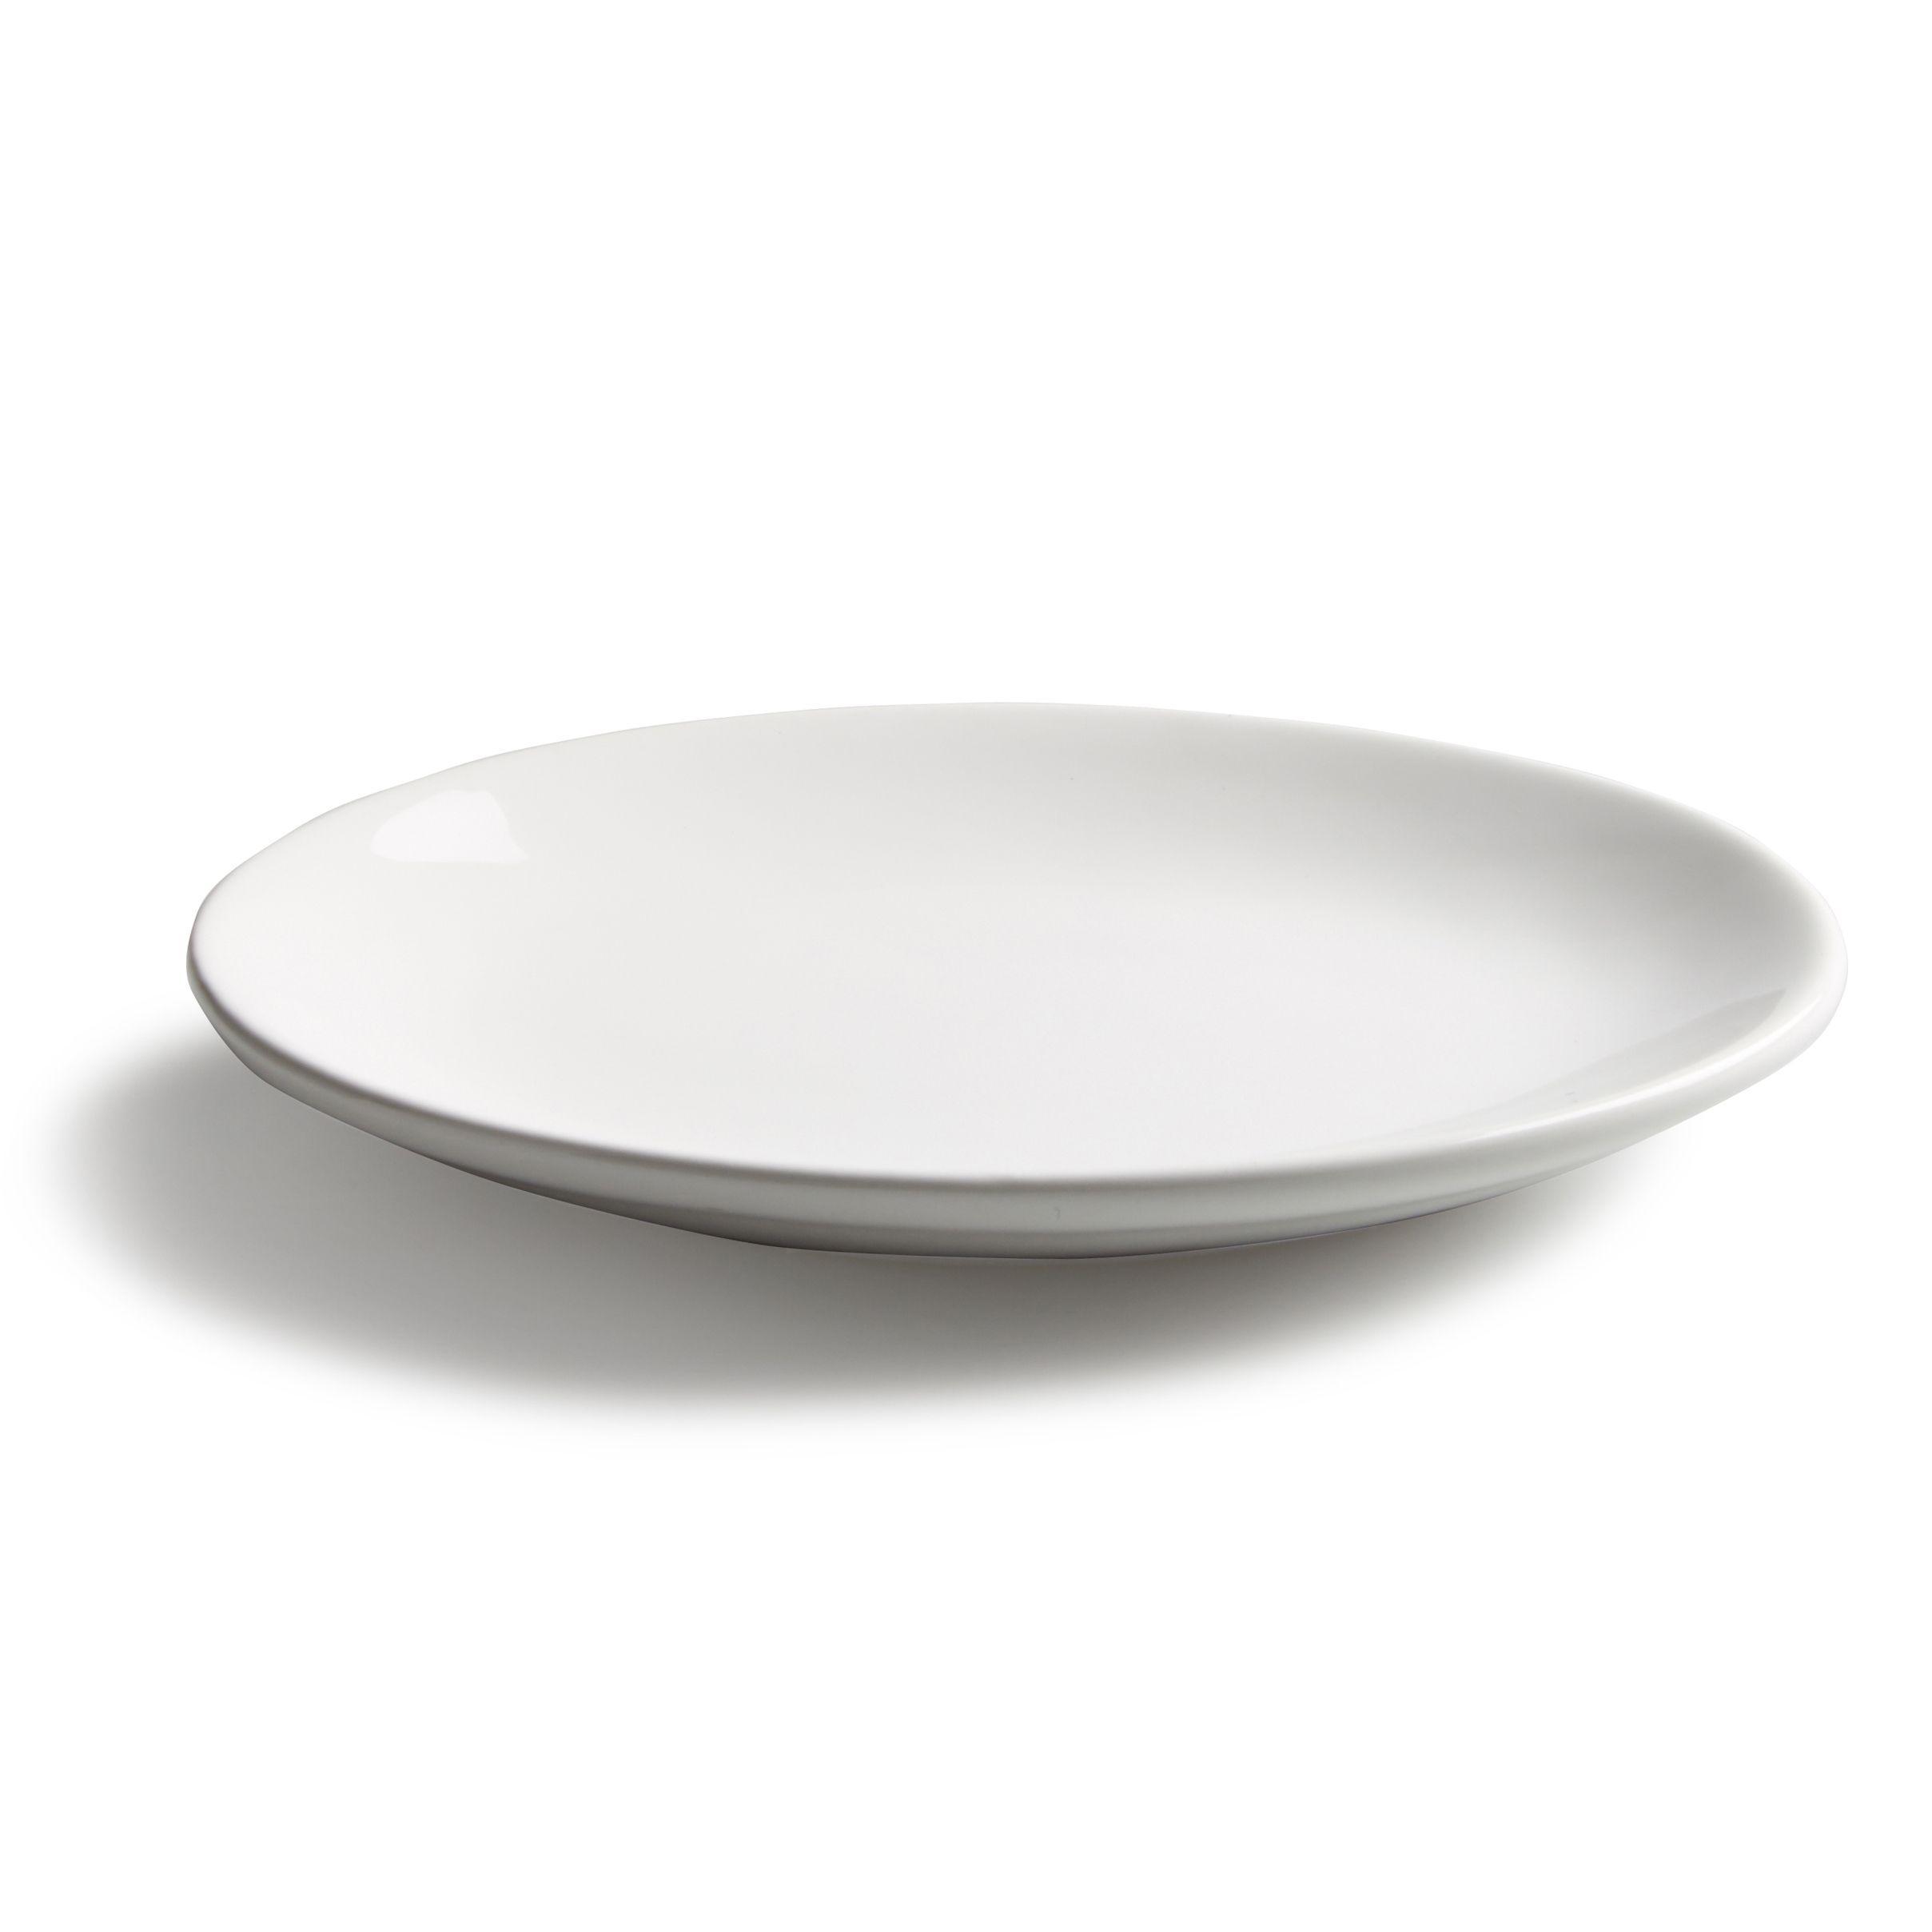 White Ceramic Soap Dish Departments Diy At B Q